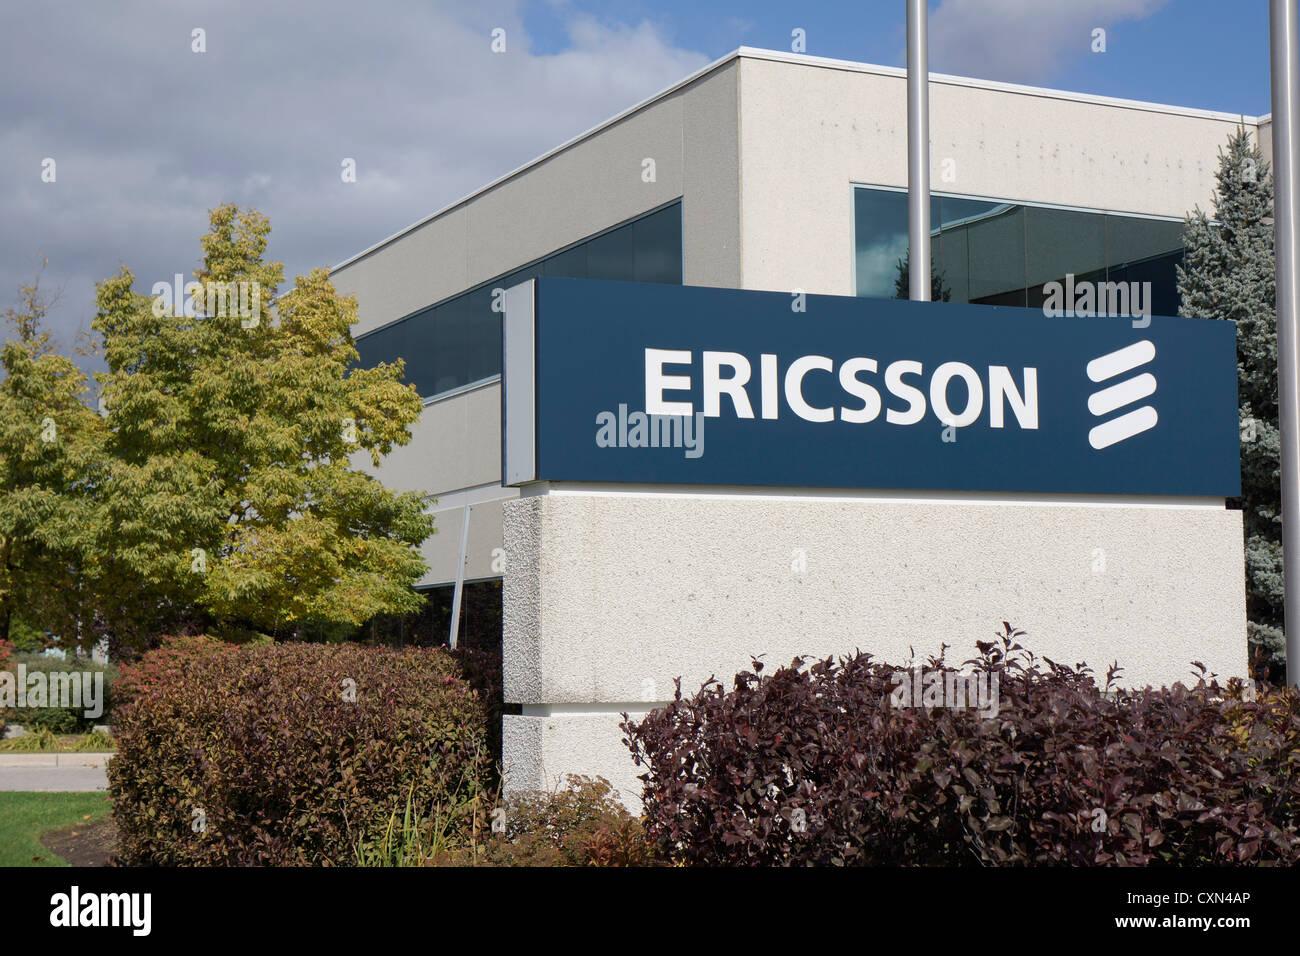 Ericsson, signo de la empresa fuera de la oficina Imagen De Stock